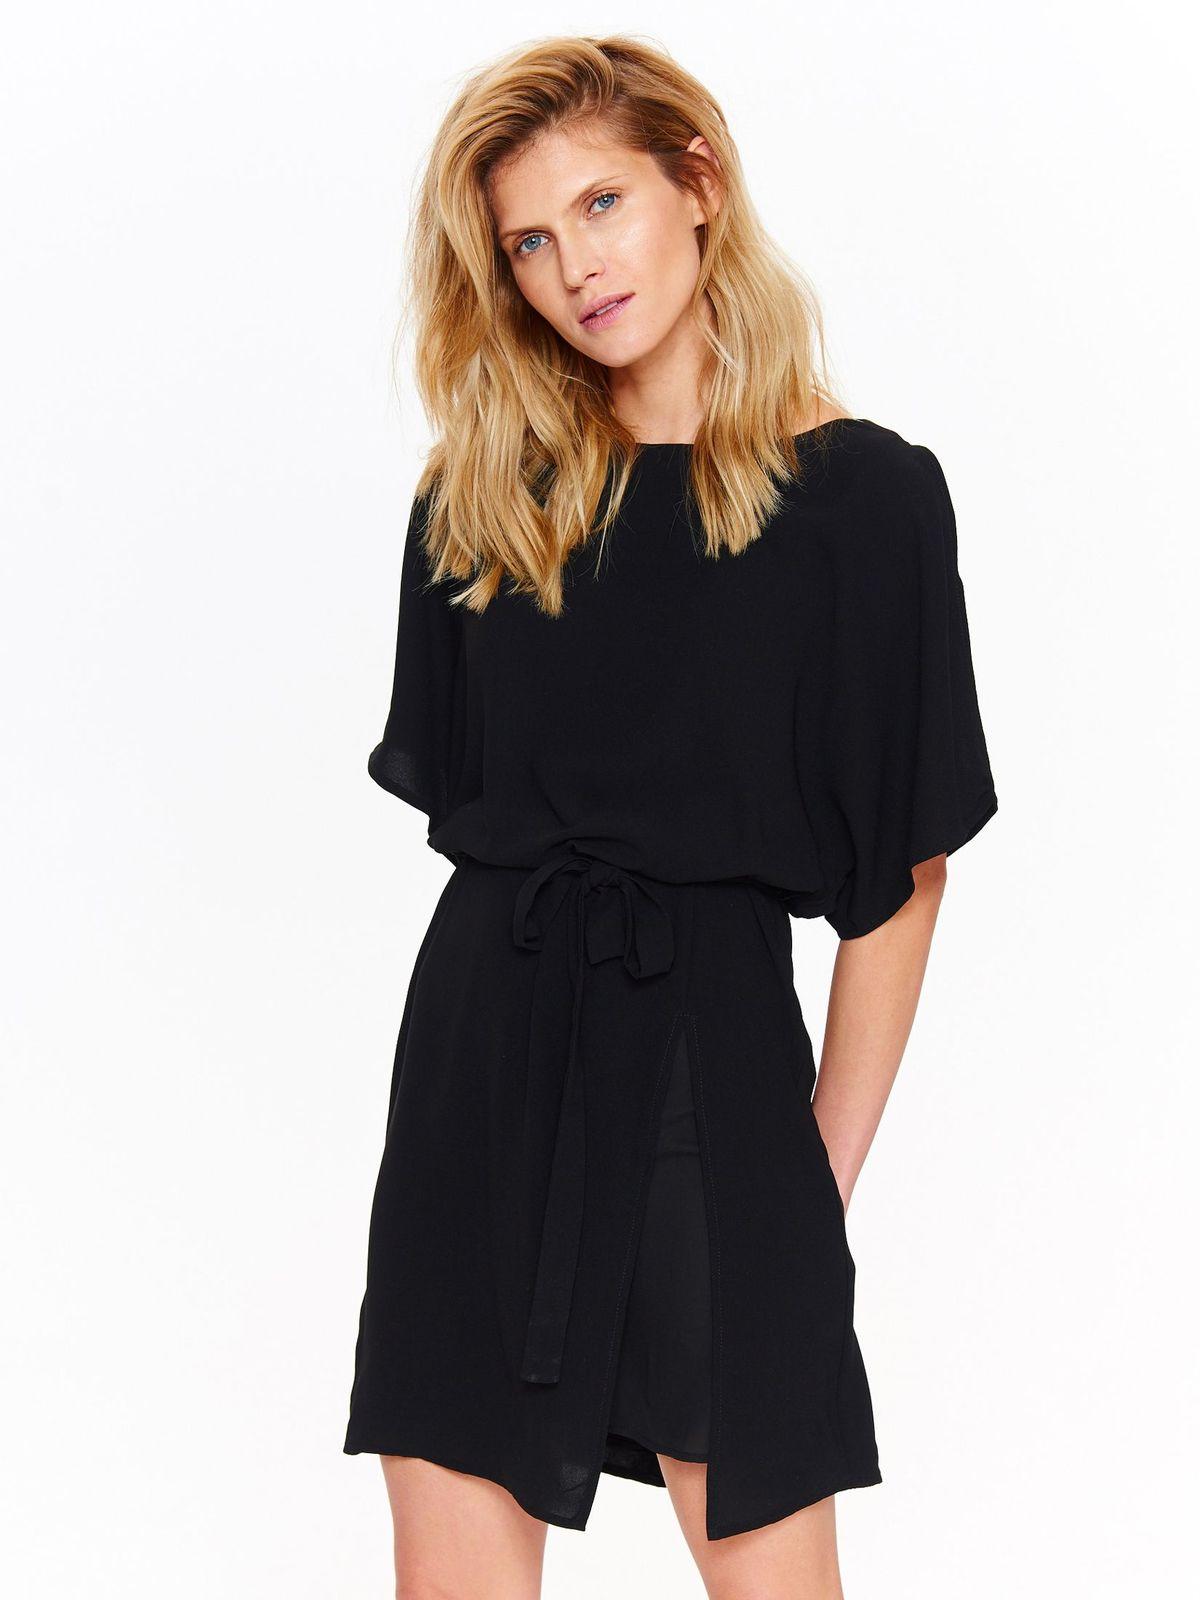 TOP SECRET TOP SECRET φορεμα με ζωνη